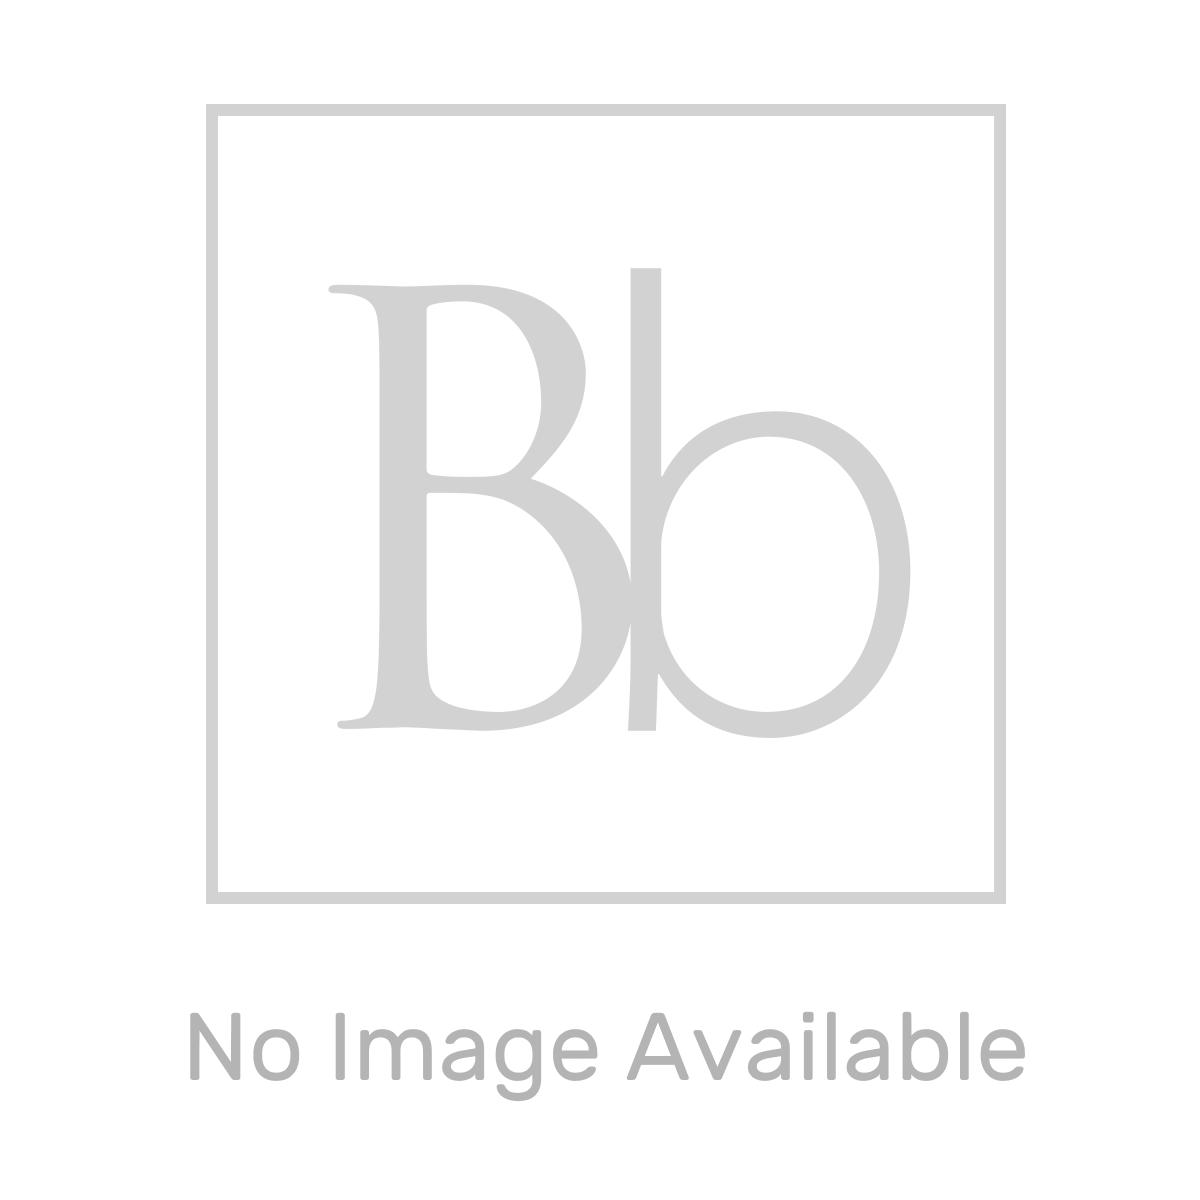 Tavistock Compass Gloss Clay Cloakroom Vanity Unit 450mm Dimensions